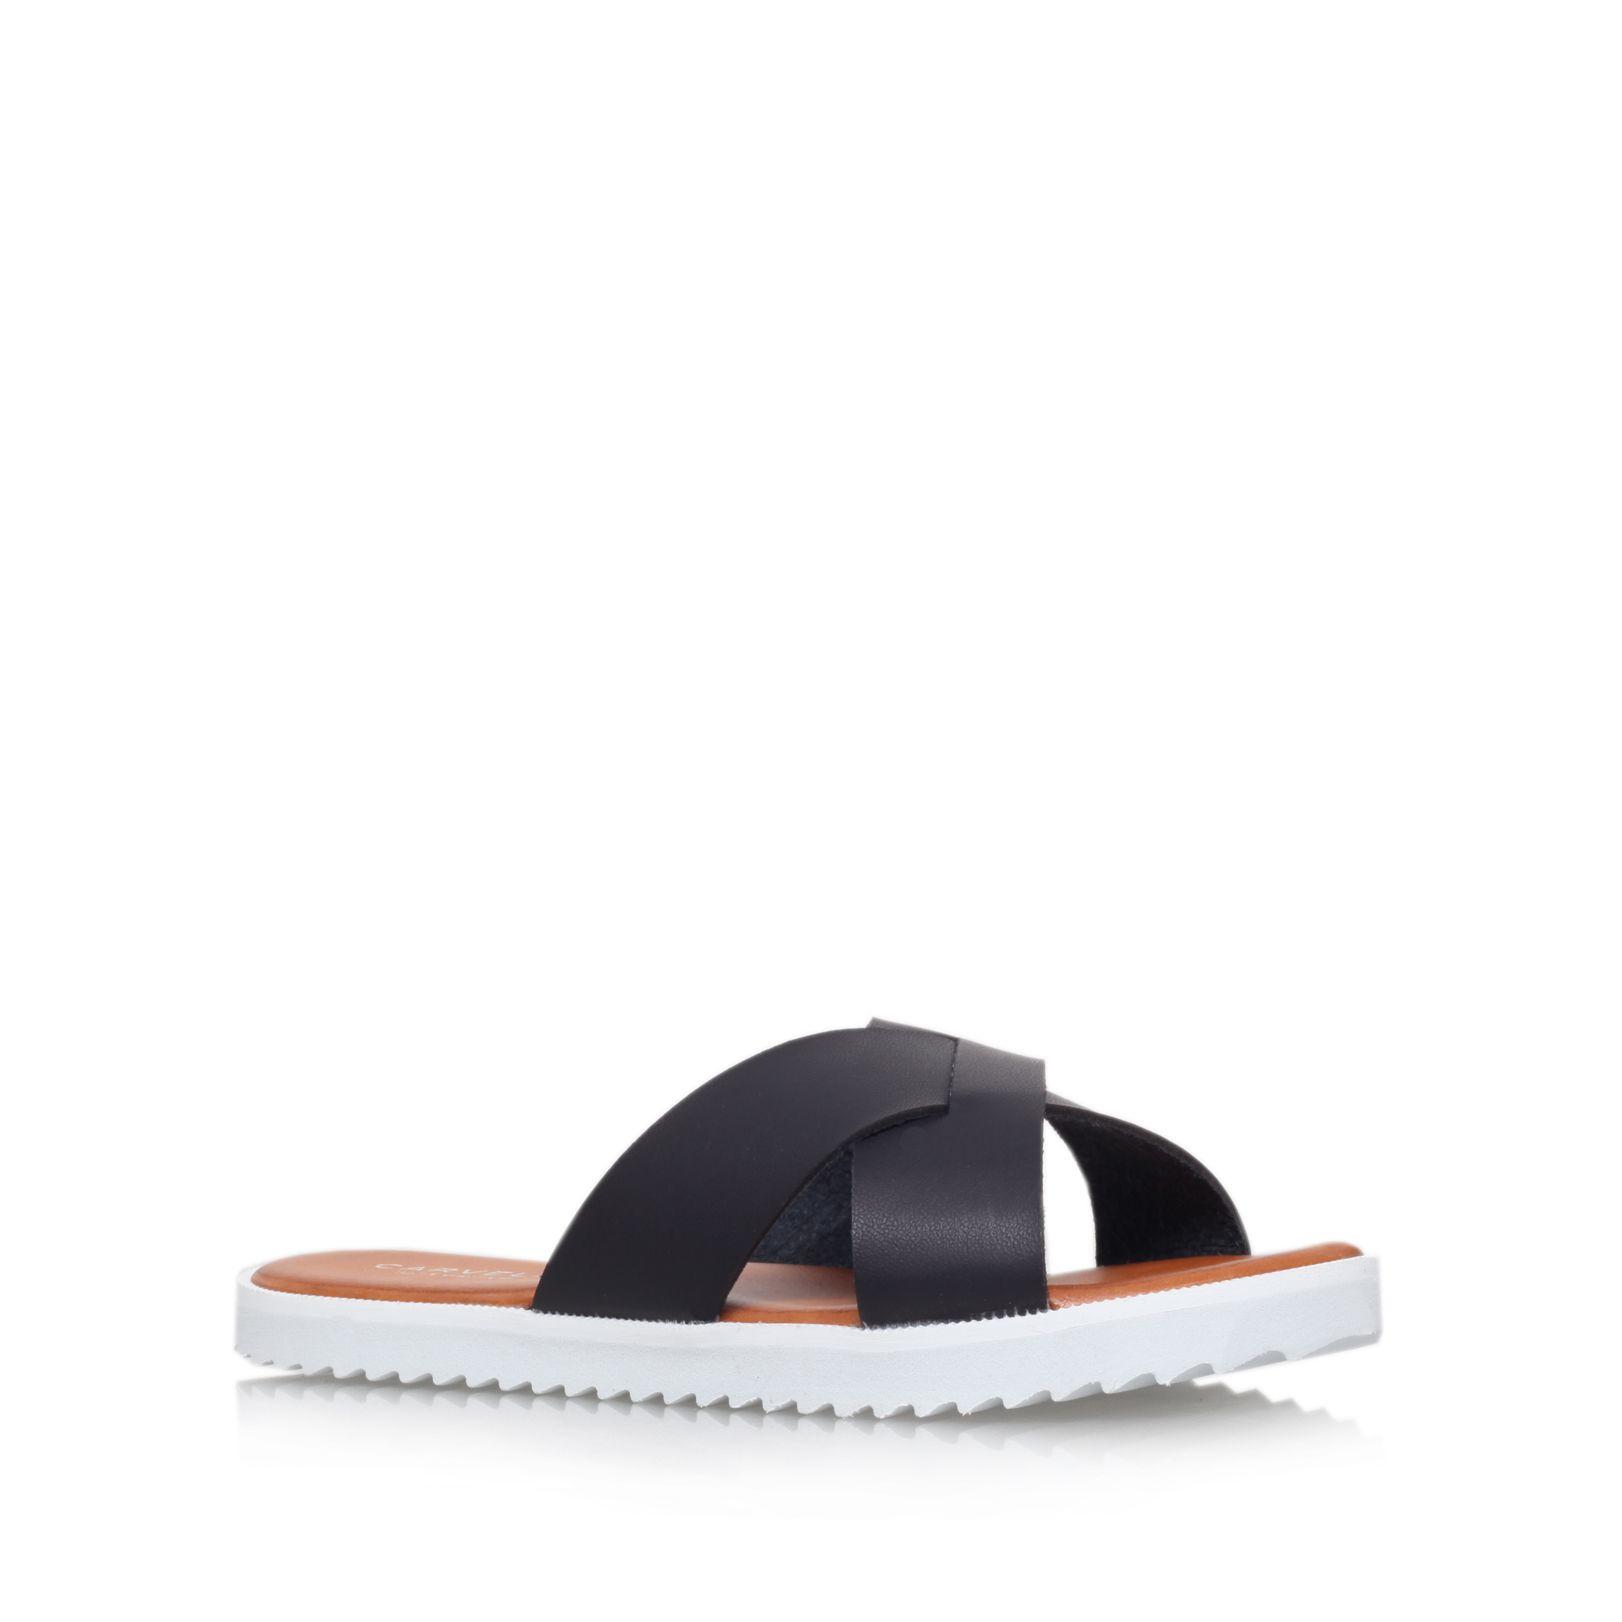 carvela kurt geiger bounce flat platform slip on sandals